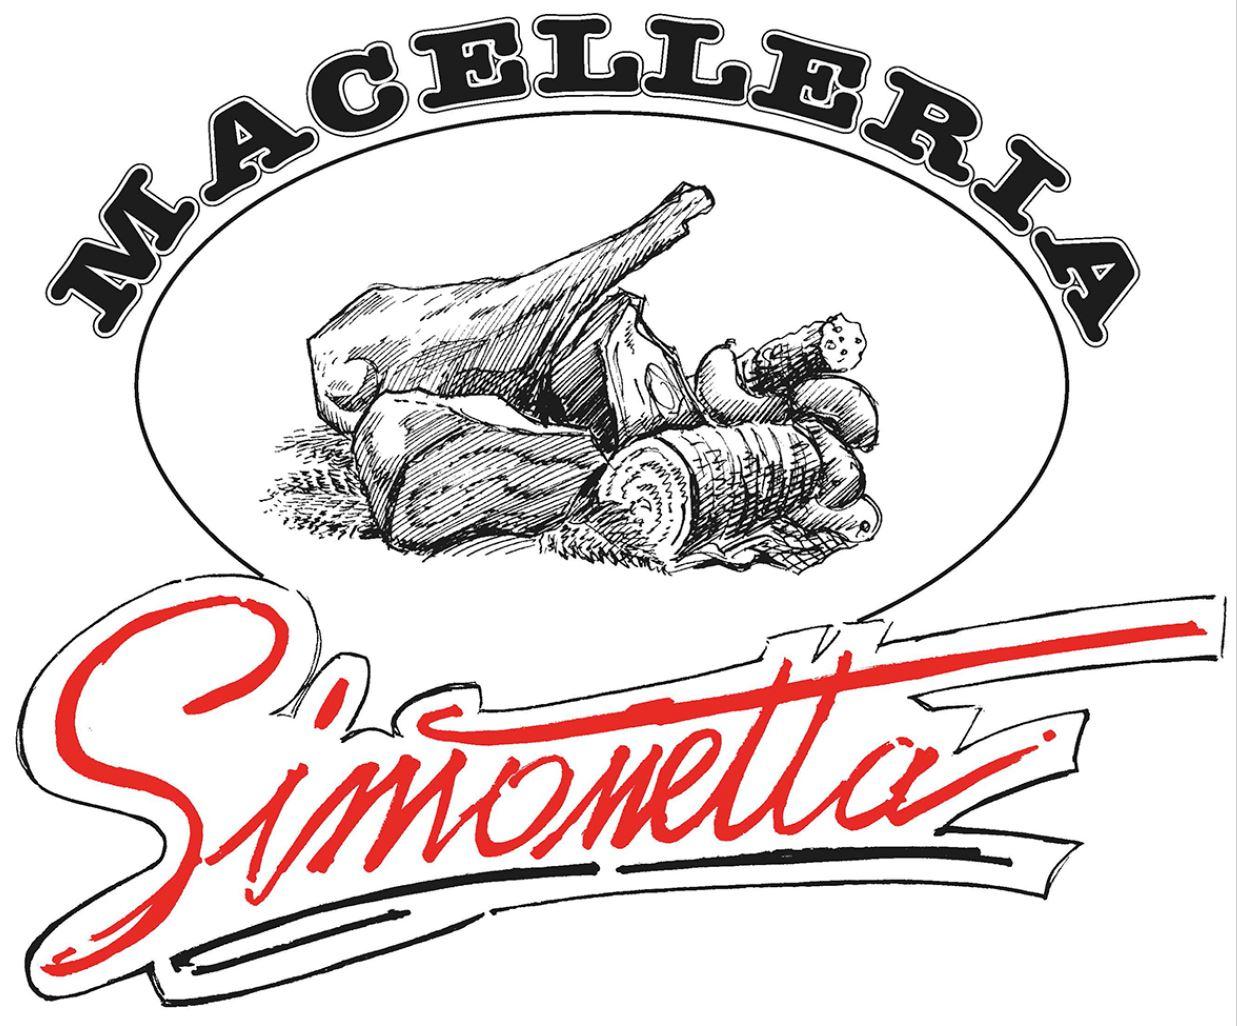 Macelleria Simonetta